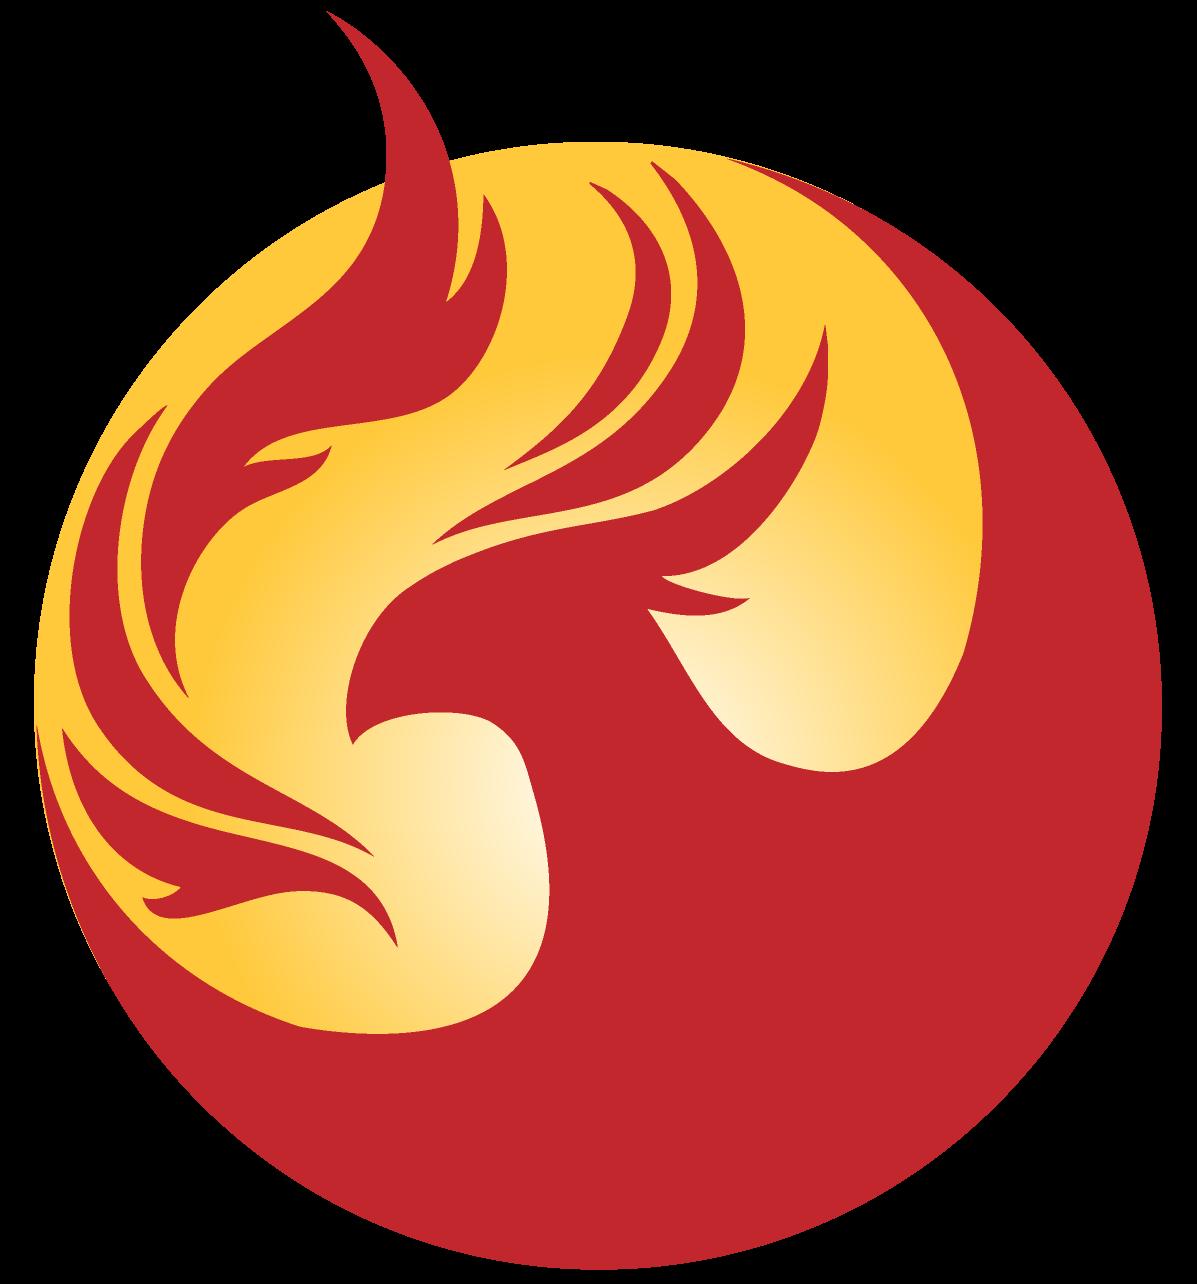 Falcon rising sun clipart banner Phoenix Logo | Arizona | Pinterest | Phoenix, Logos and Tattoo banner